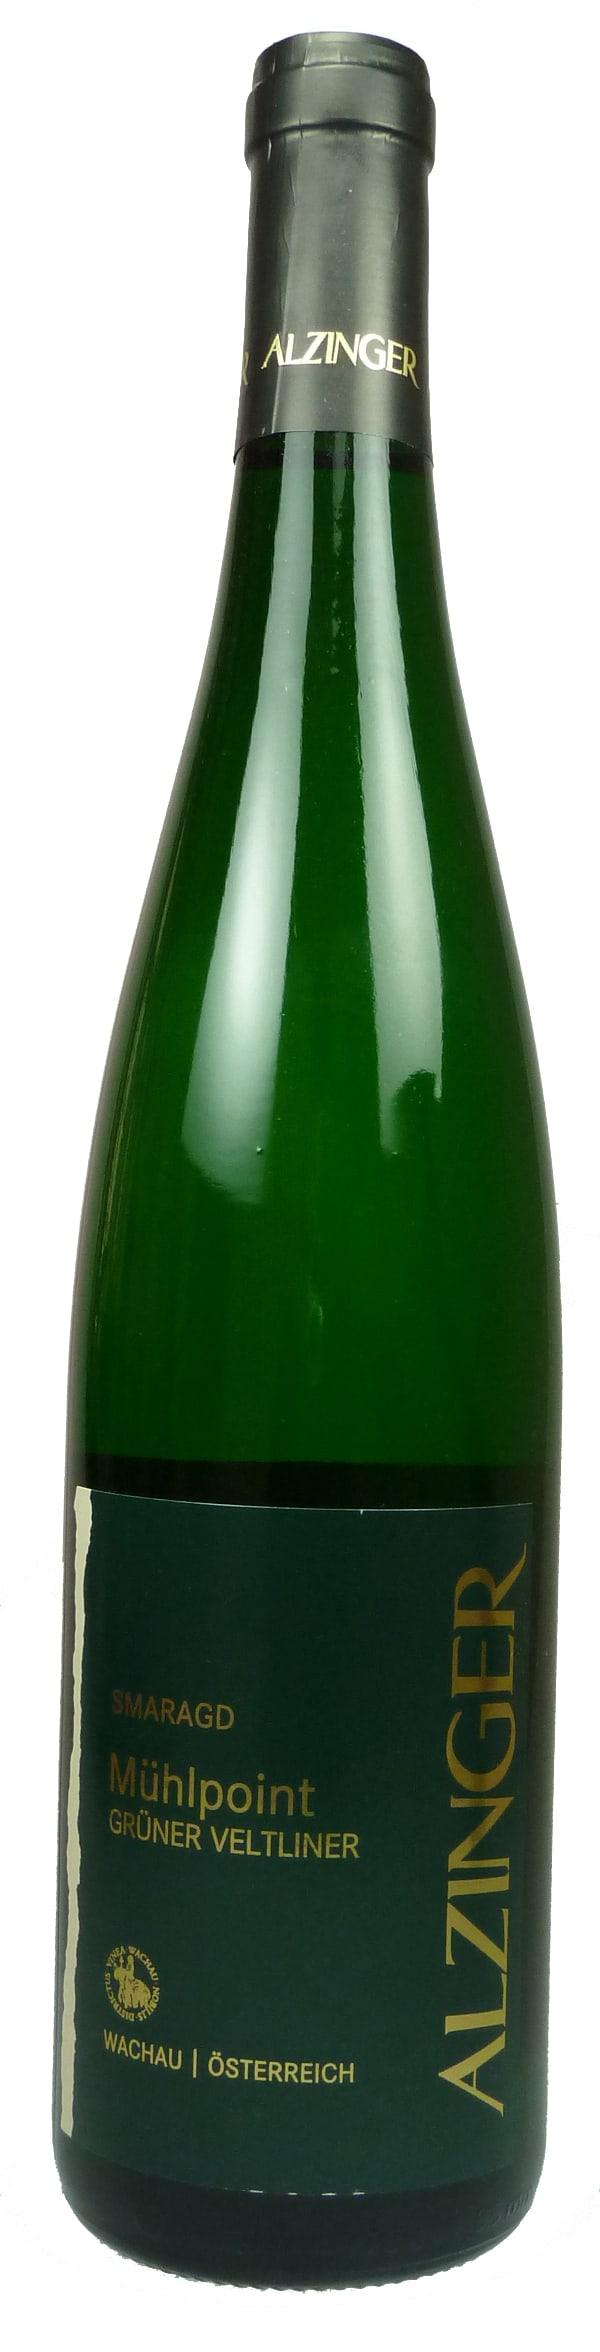 Grüner Veltliner Mühlpoint Smaragd 2017